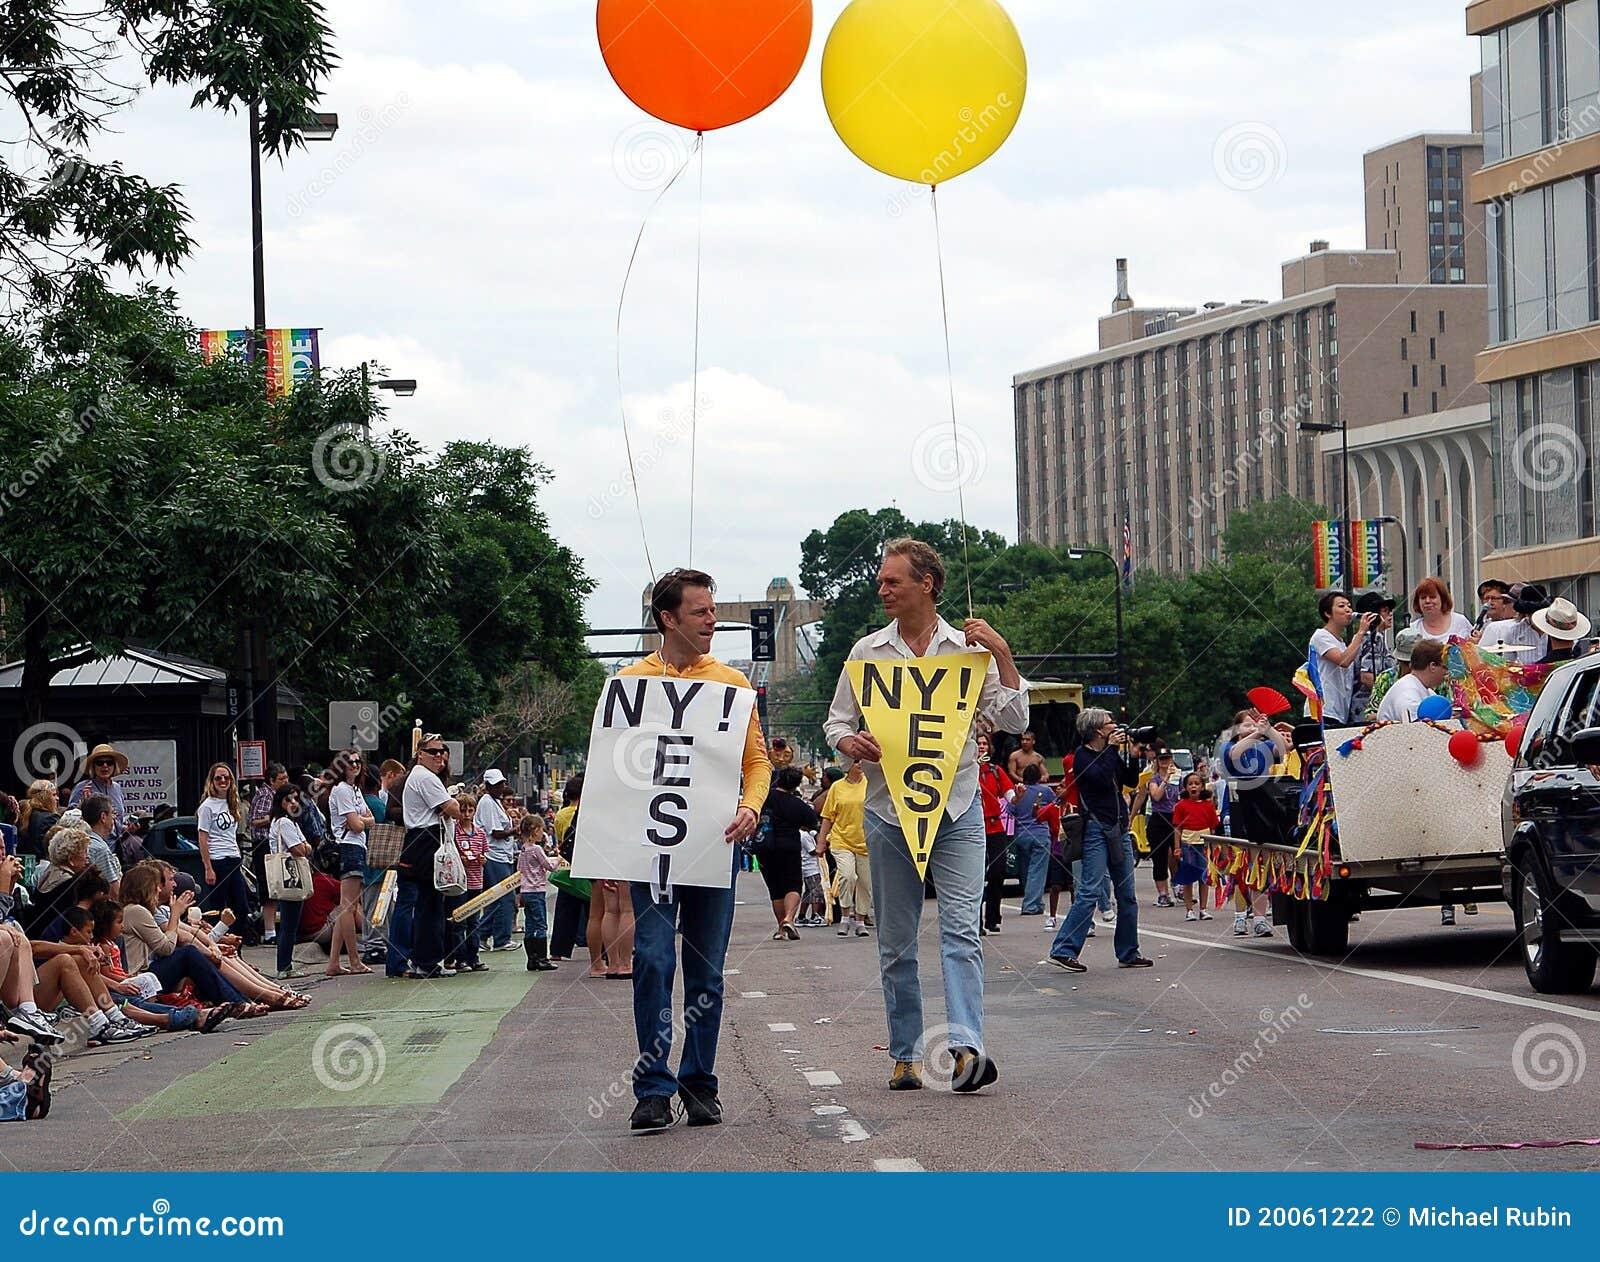 gay pride minneapolis minnesota